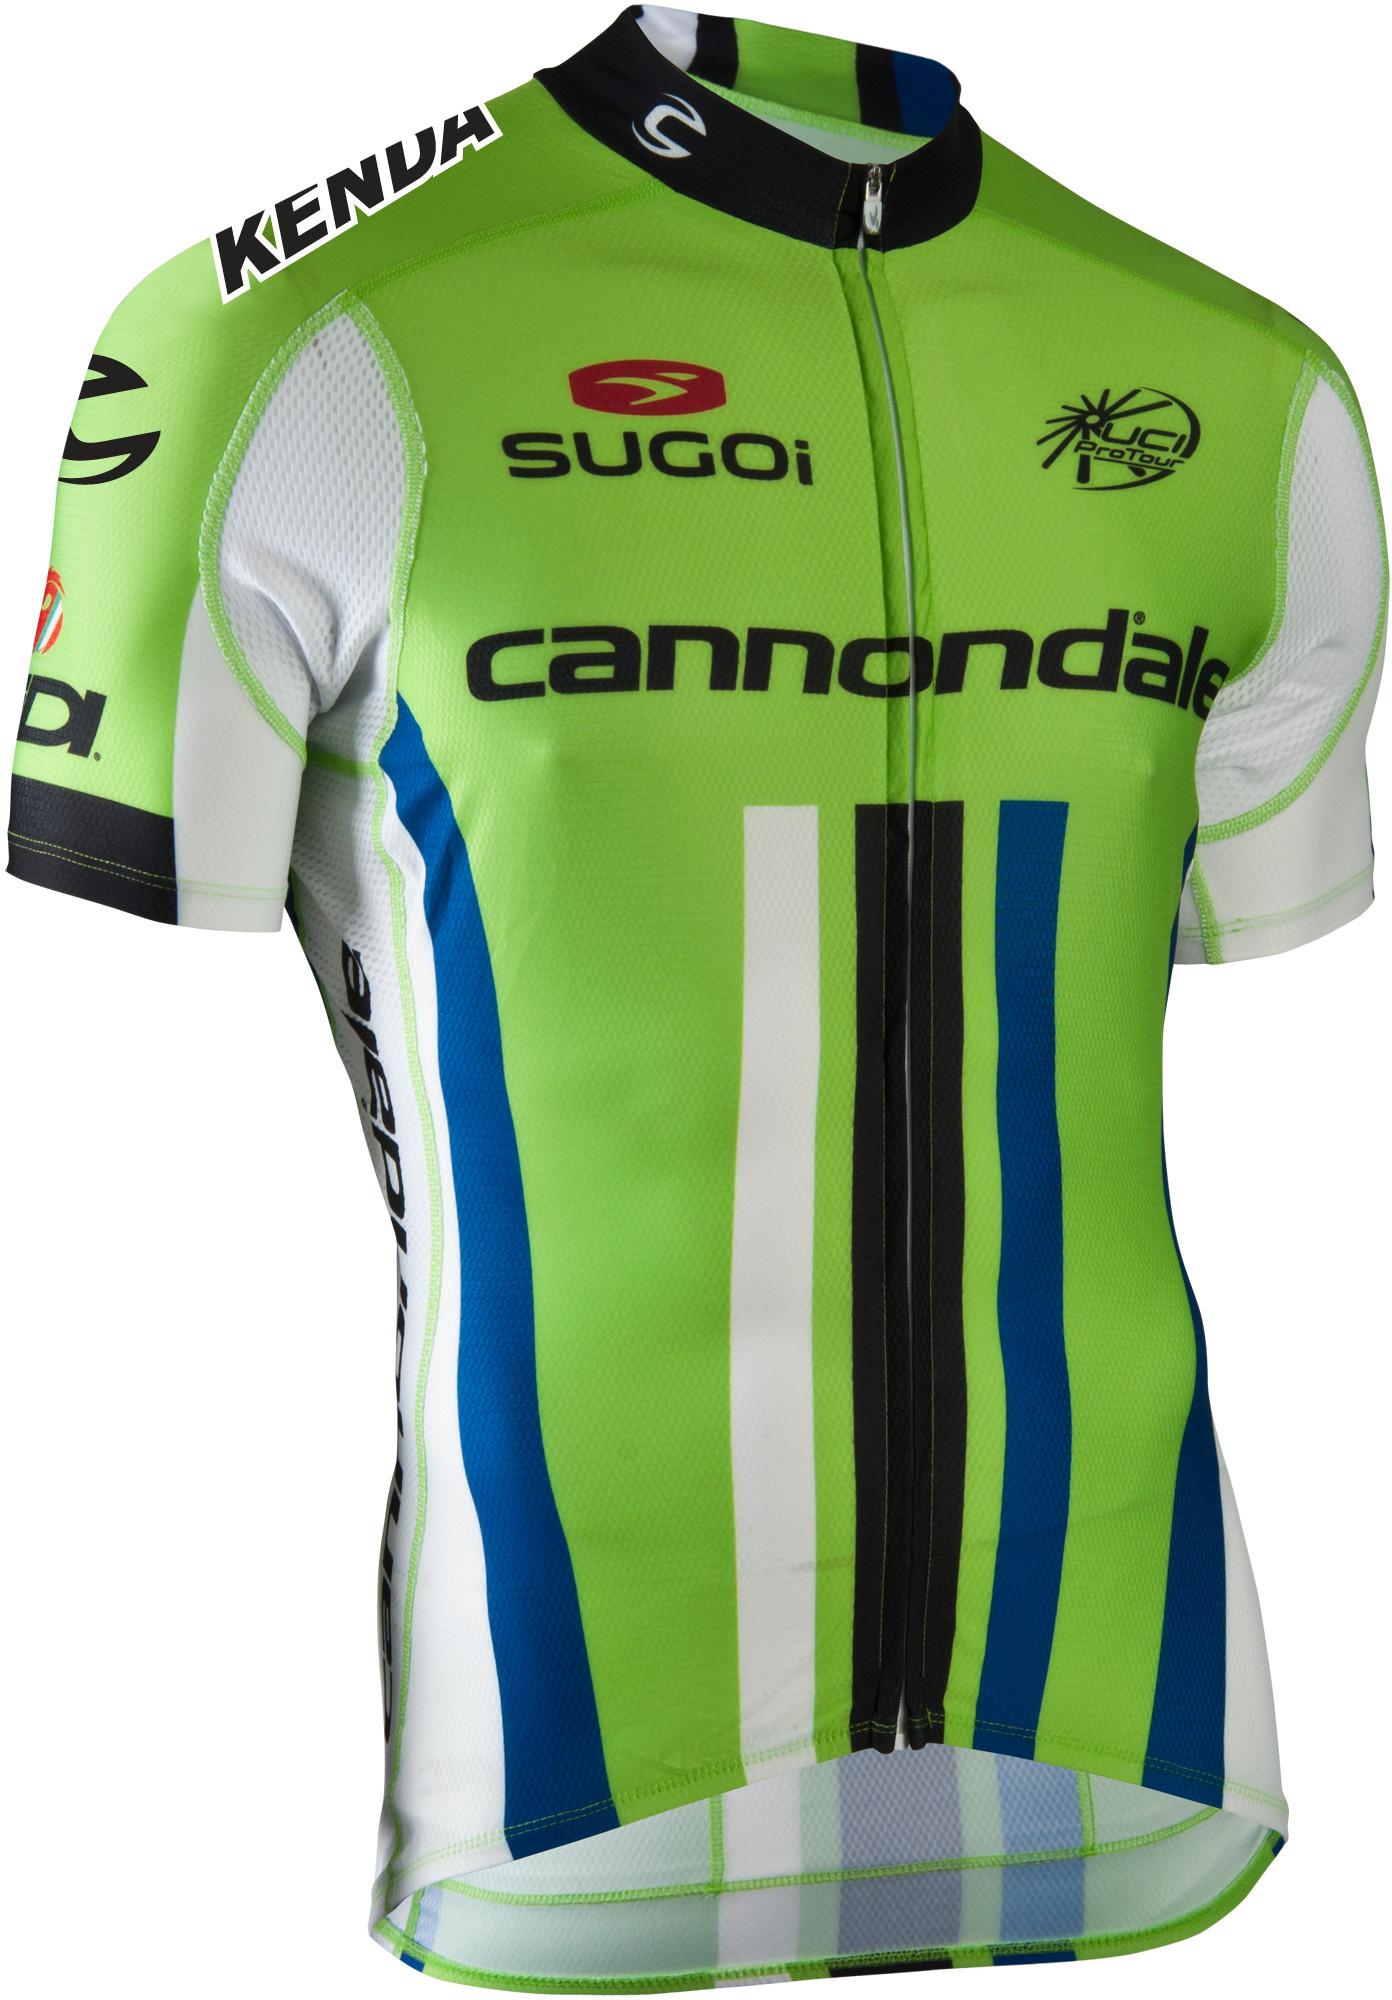 764df8f5722 Sugoi Cannondale Pro Cycling Team Jersey - Montclair Bike Shop ...